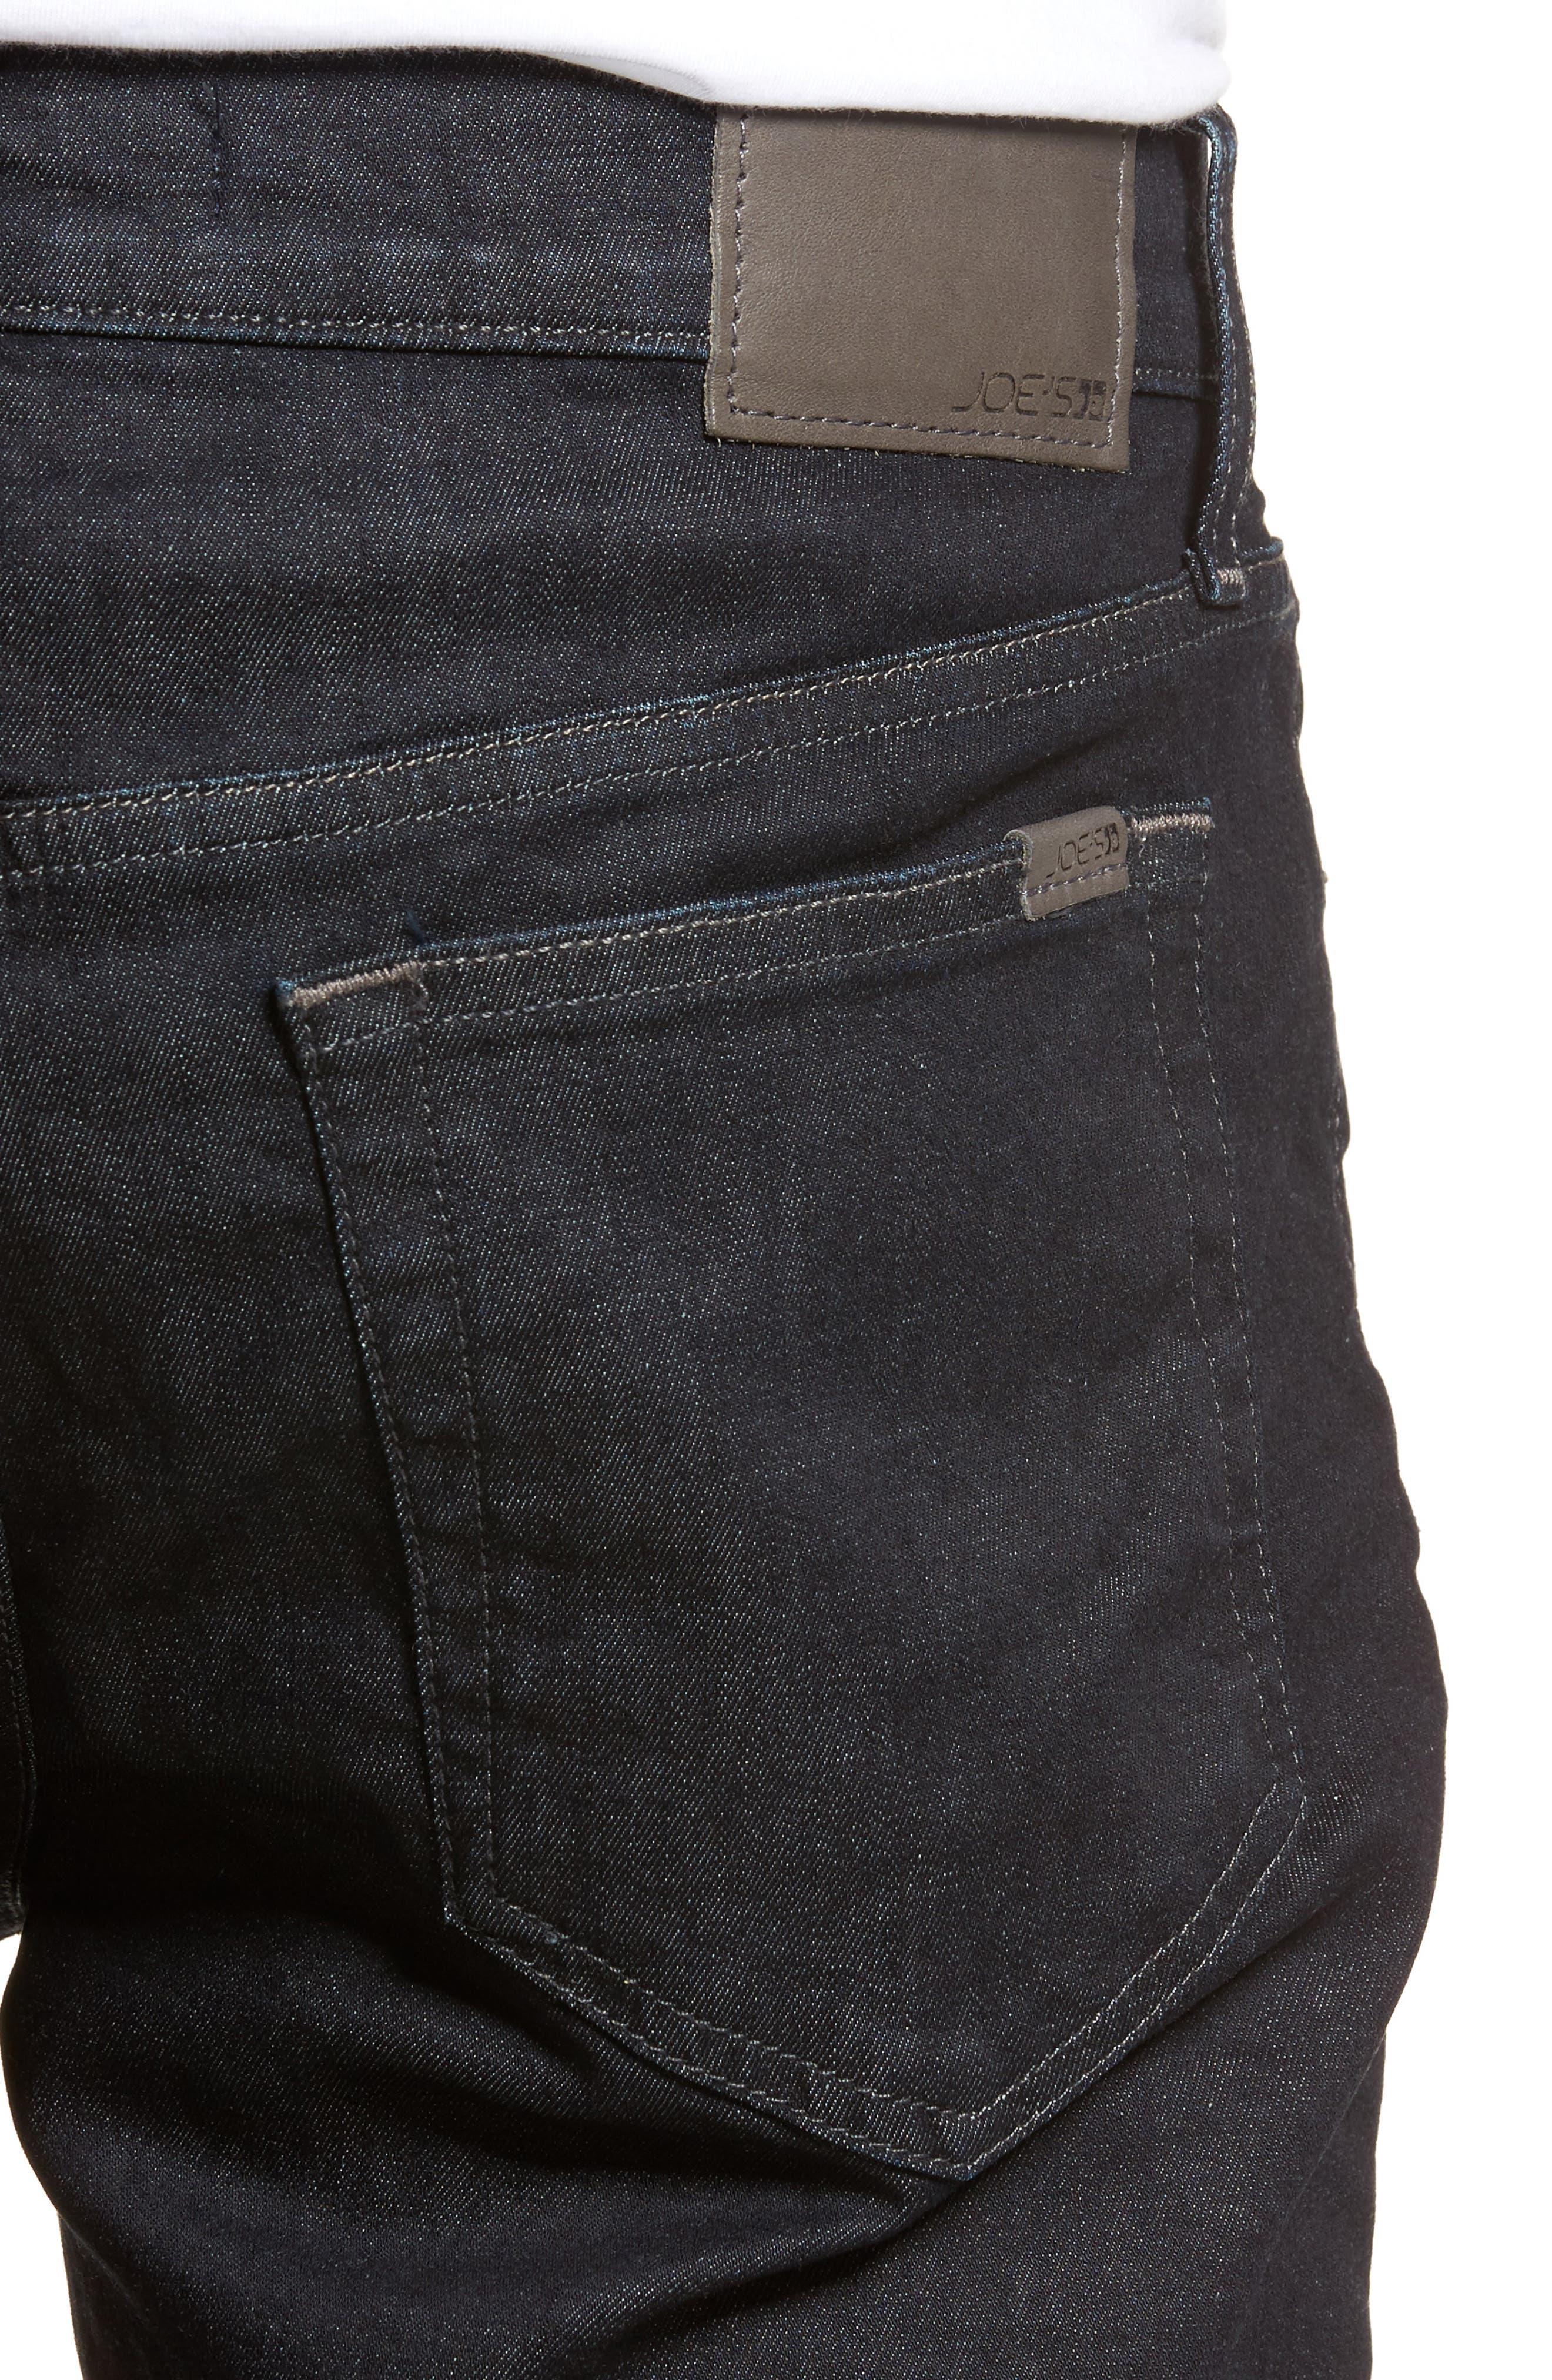 Slim Fit Jeans,                             Alternate thumbnail 4, color,                             Taft